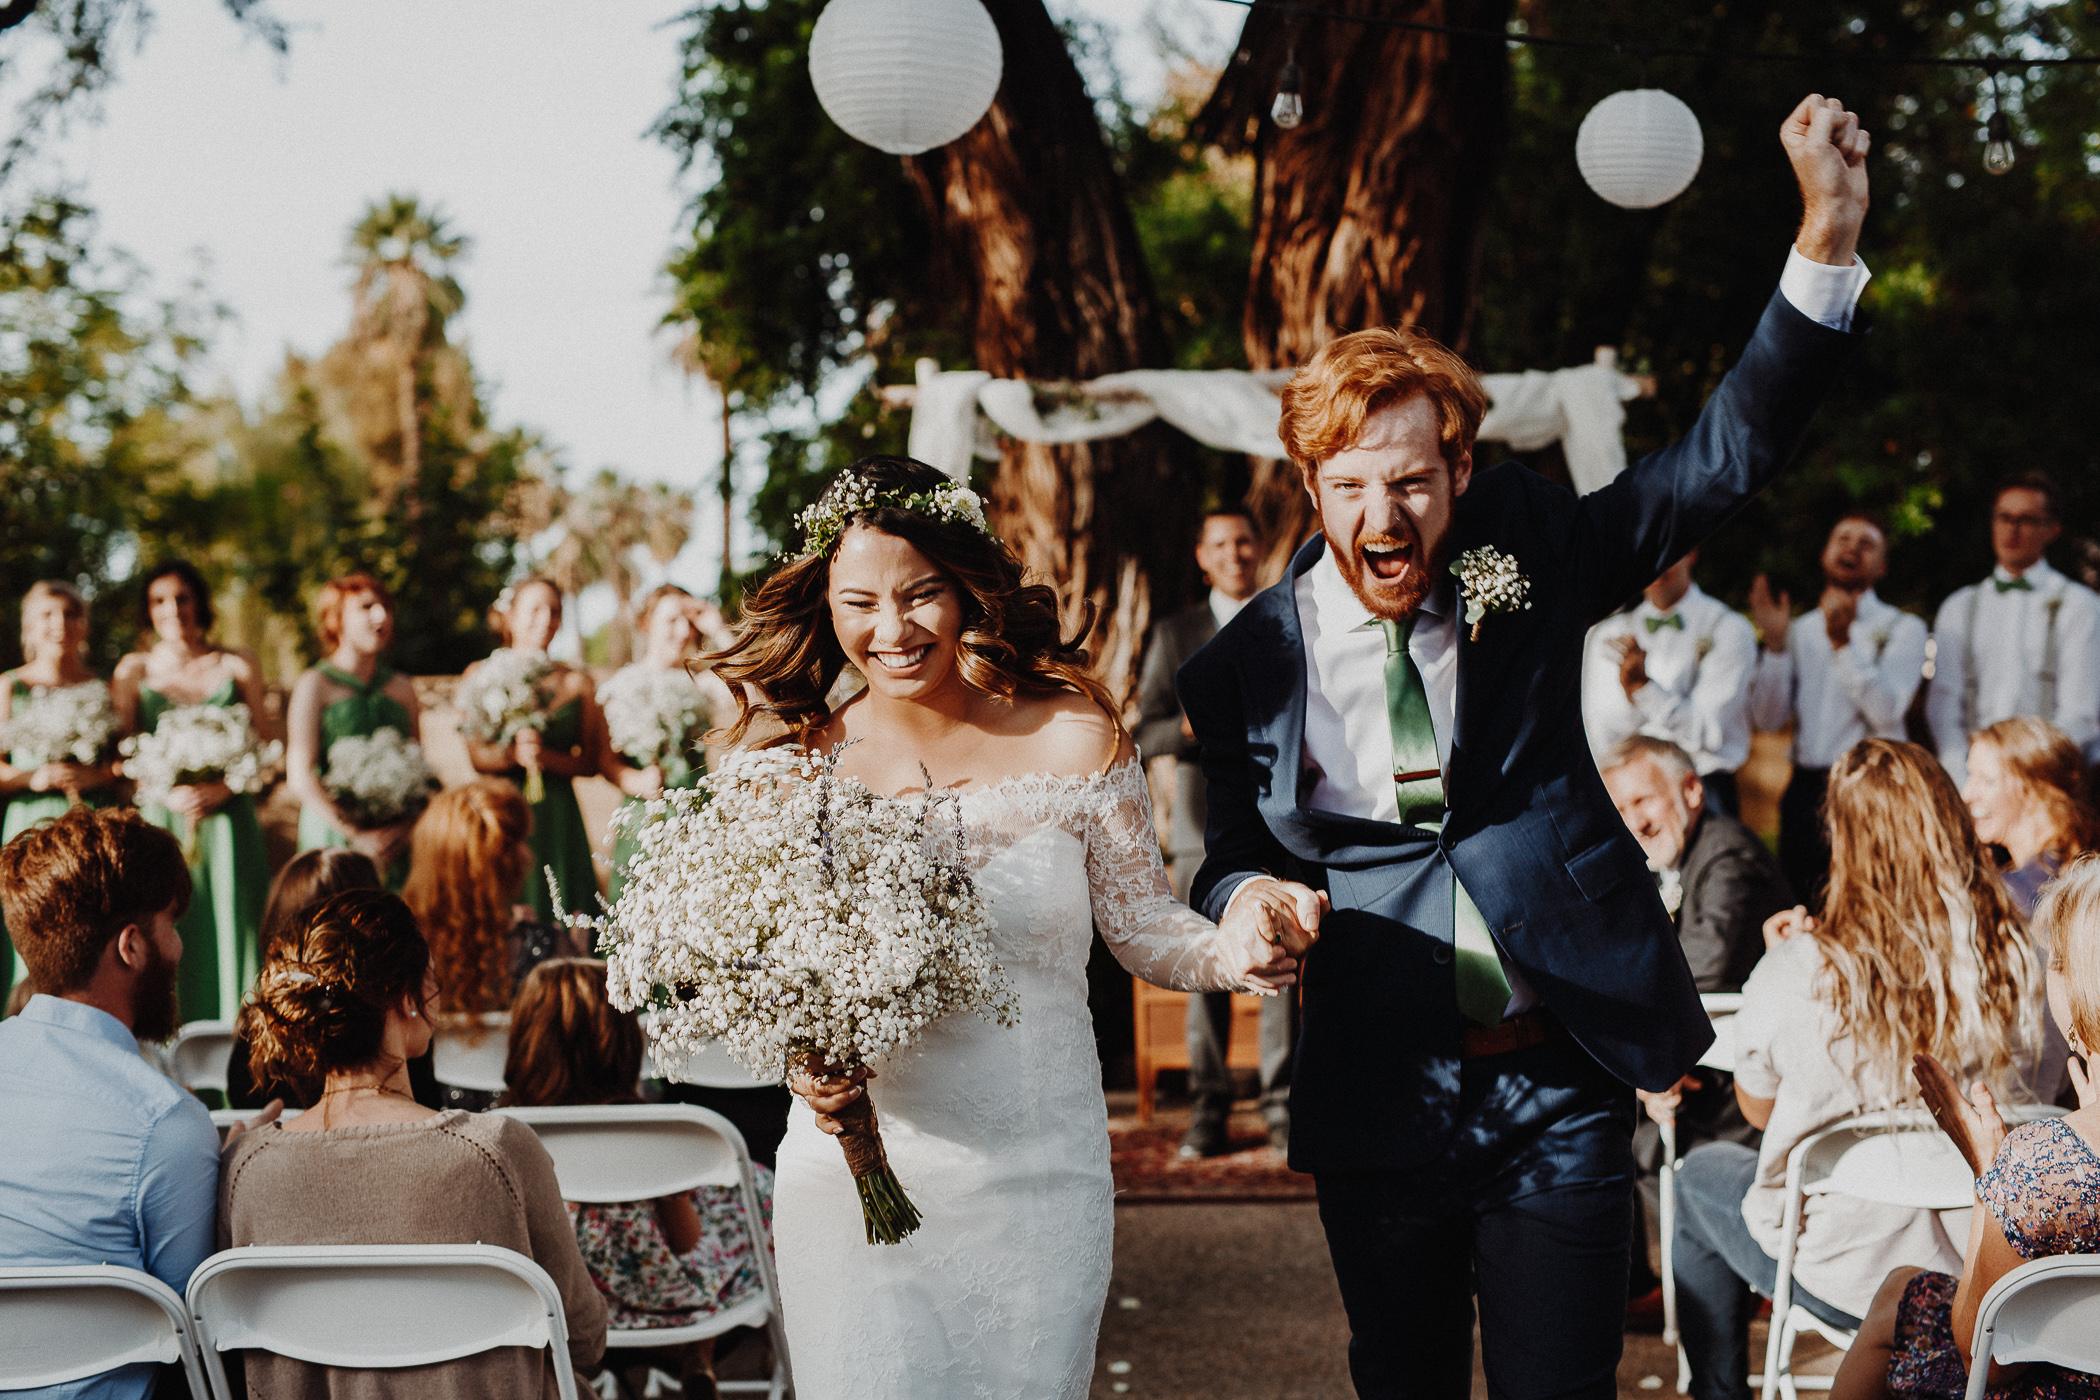 181104-Luxium-Weddings-Arizona-@matt__Le-Brandon-Kariana-Phoenix-Valley-Garden-Center-1073a.jpg